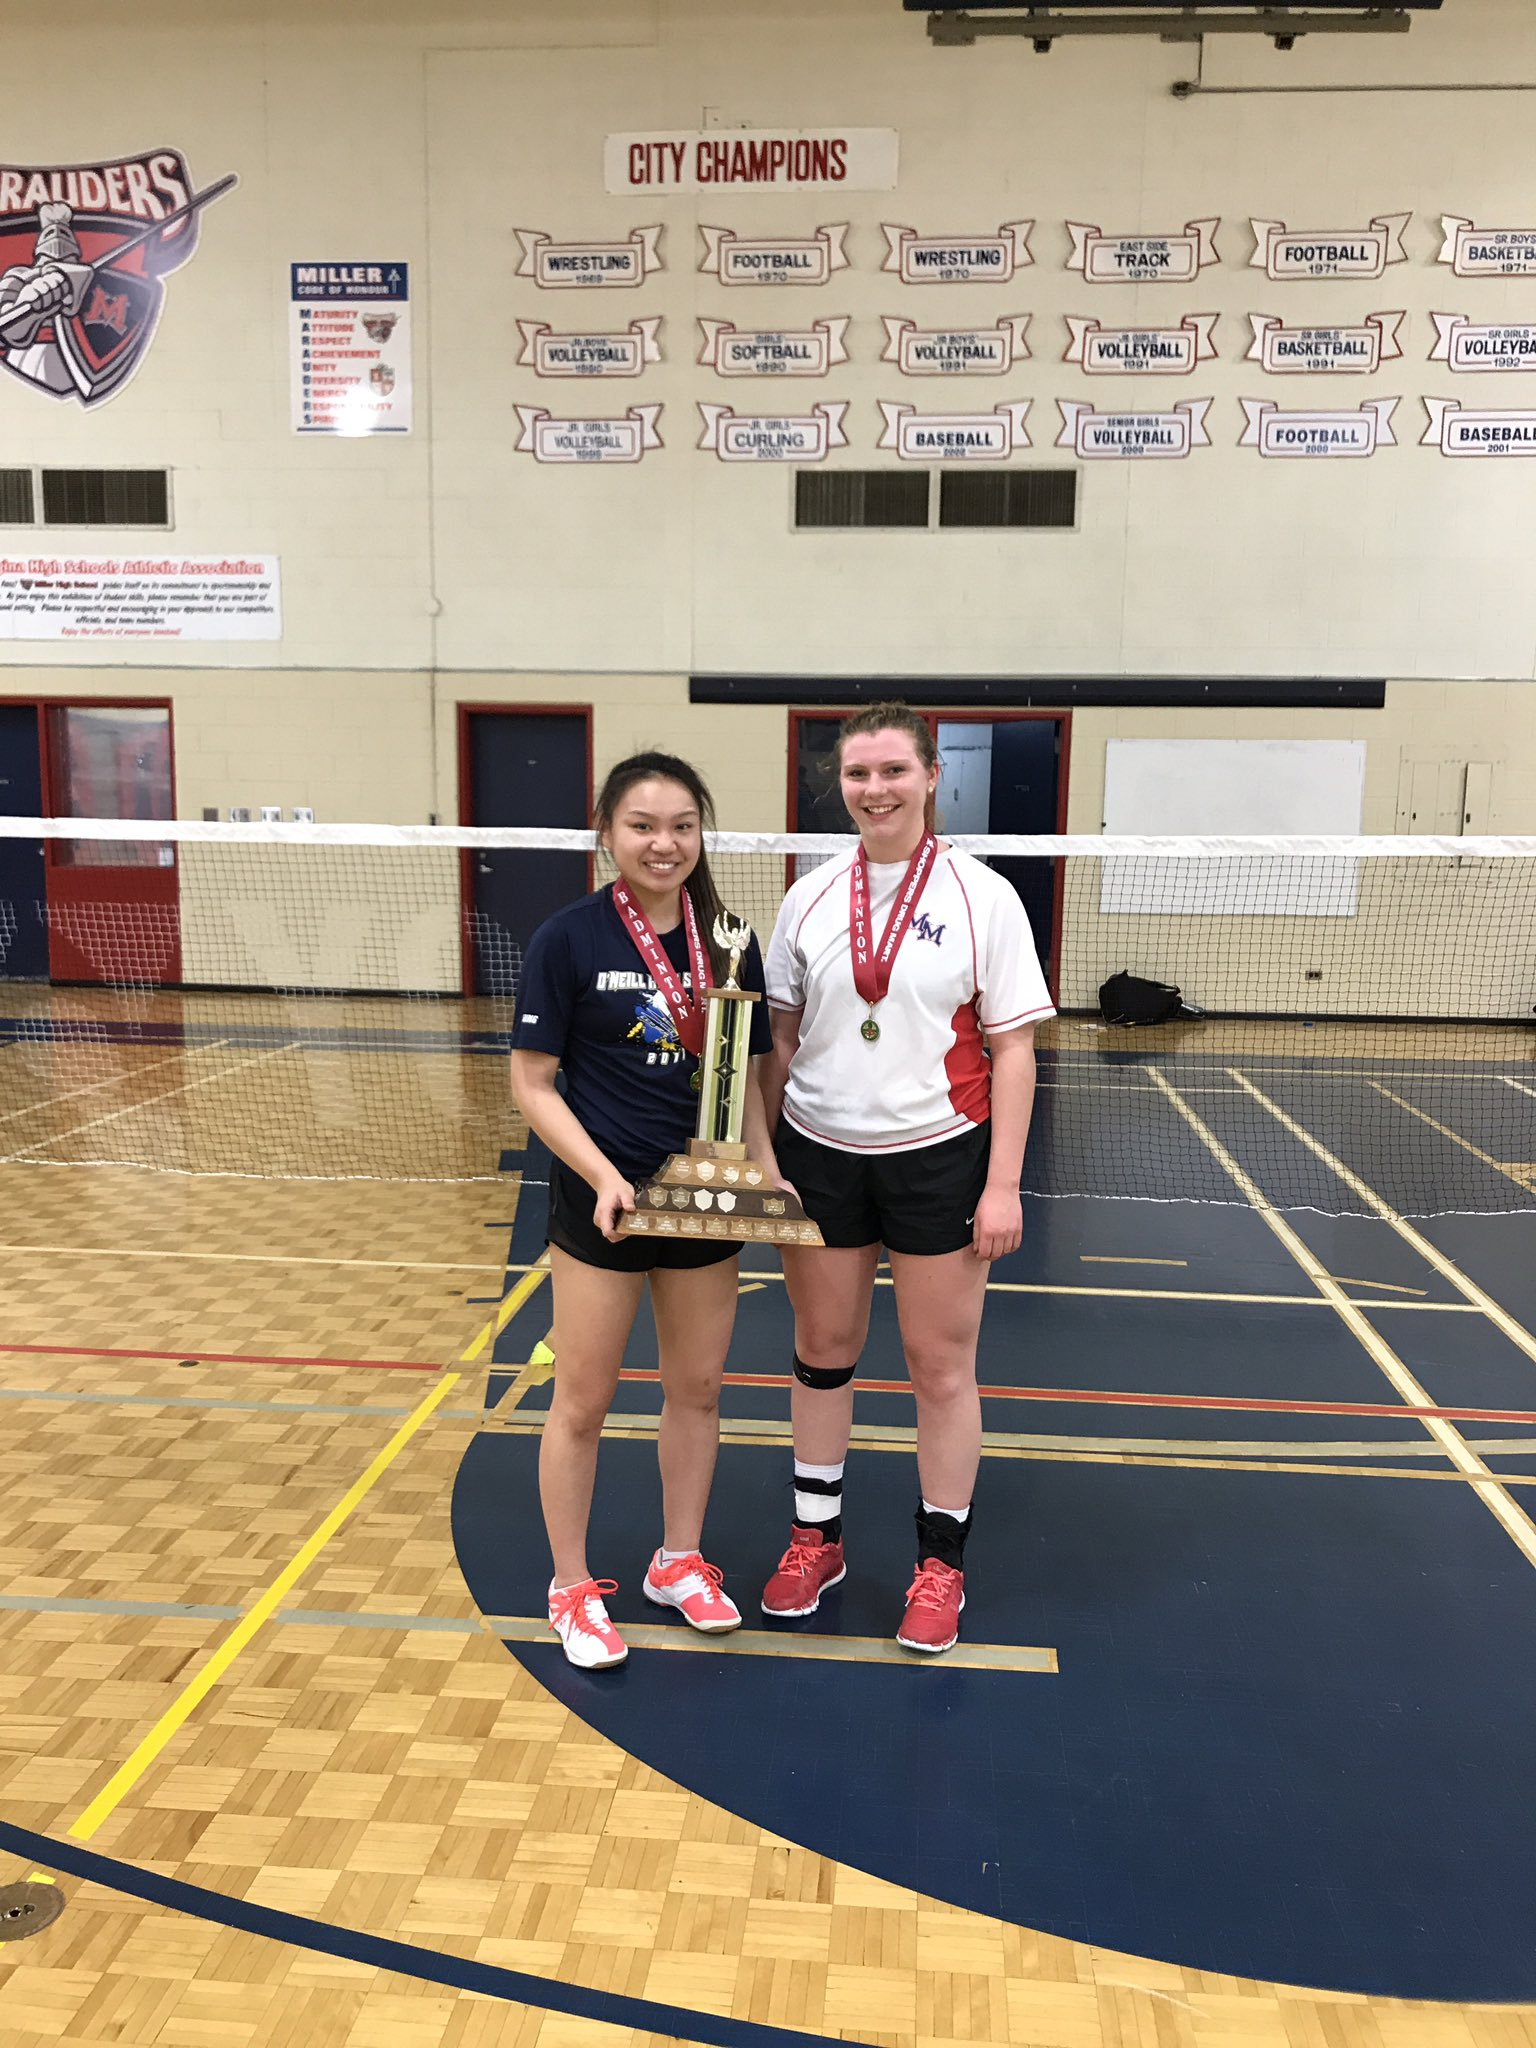 Congrats ONeill on winning Girls Singles Badminton Title!  Shout to Miller on taking home silver! https://t.co/TAVCaQkYOe